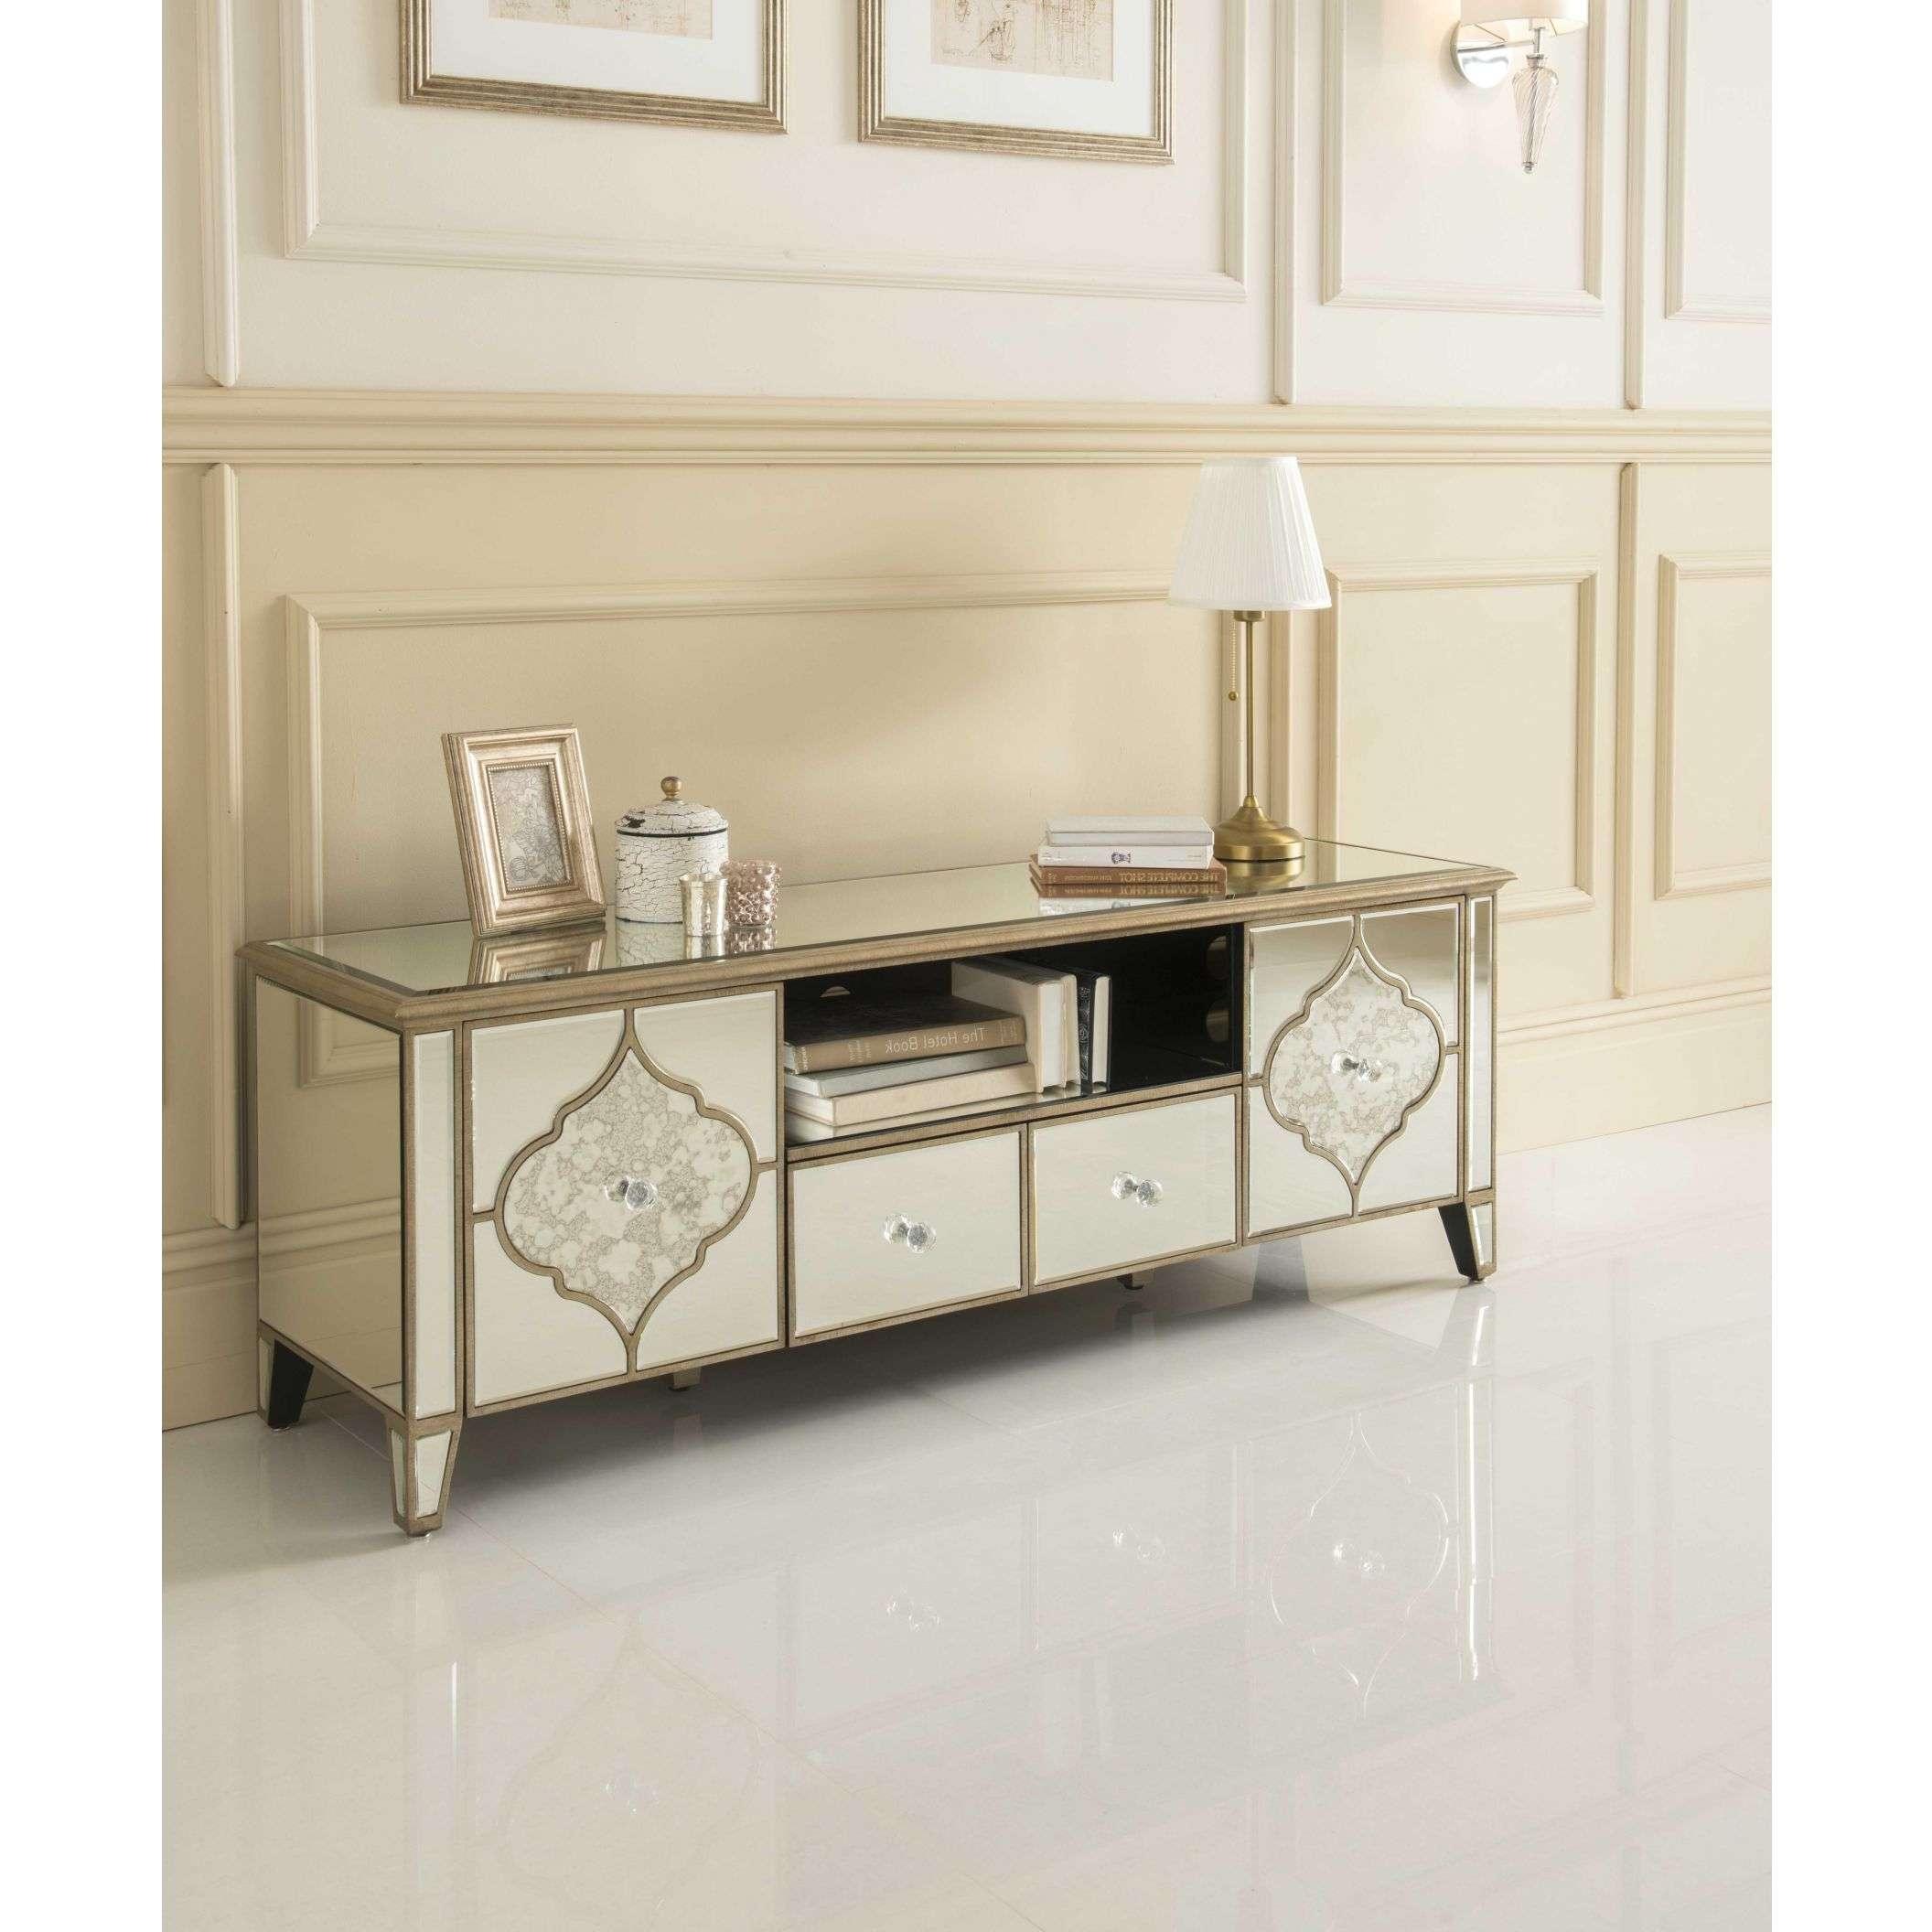 Sassari Mirrored Tv Cabinet | Glass Furniture Regarding Mirror Tv Cabinets (View 3 of 20)